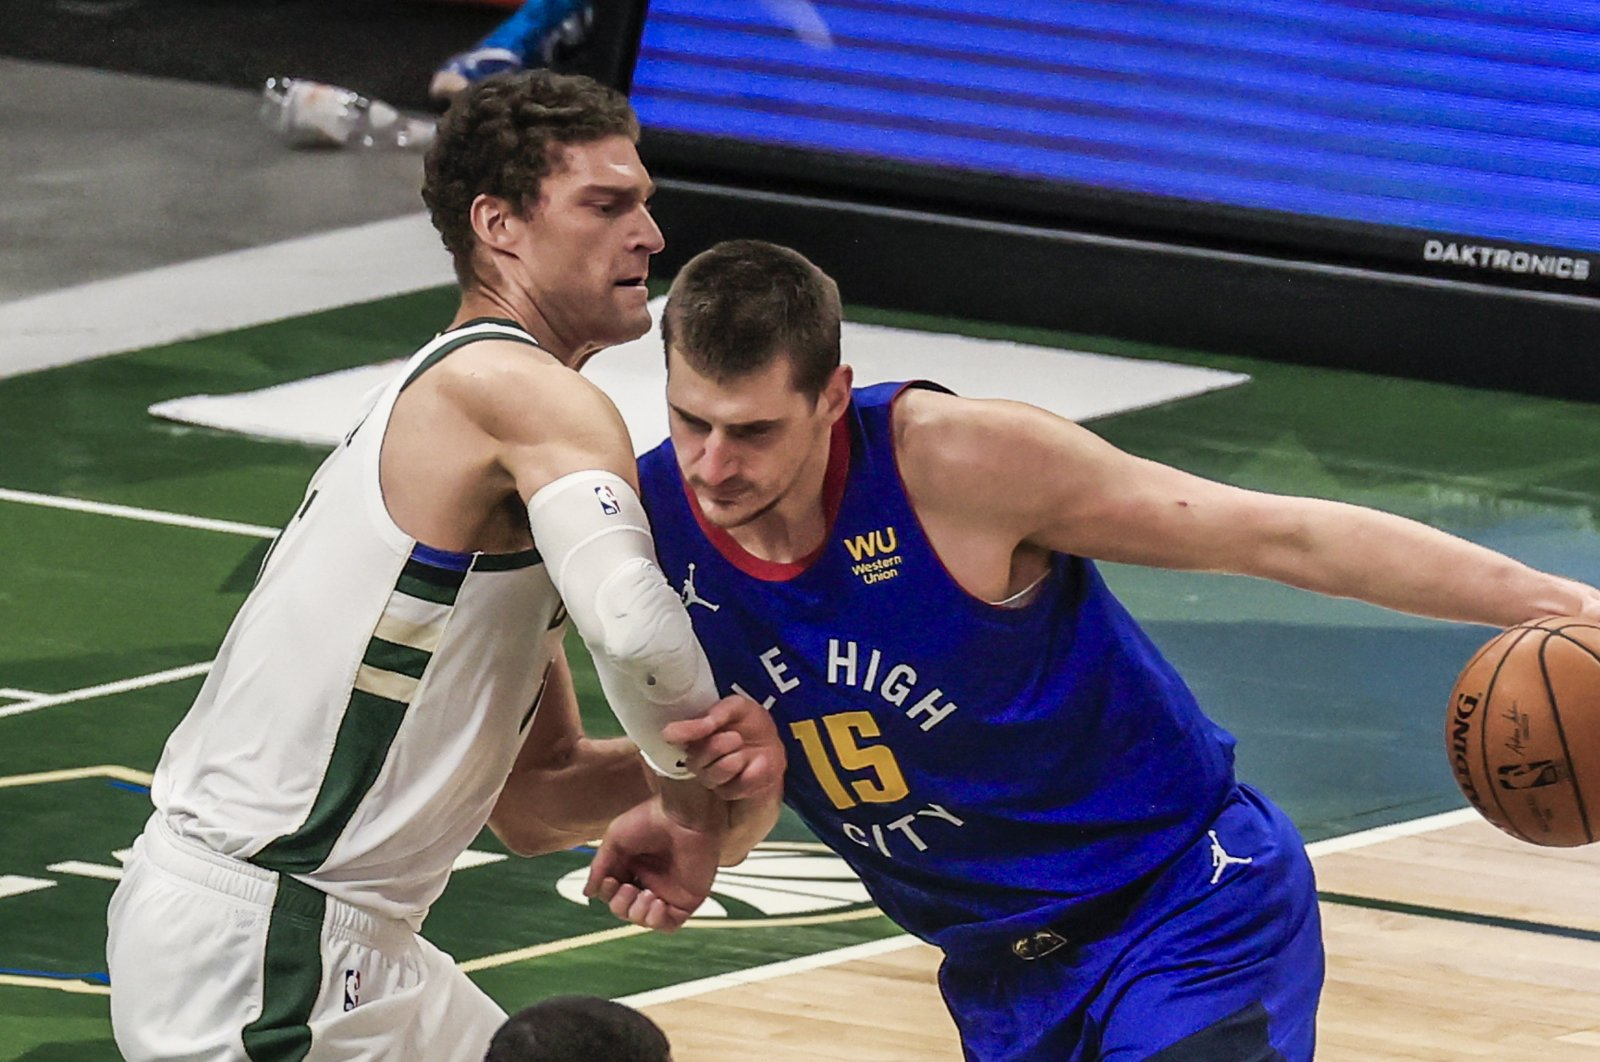 Denver Nuggets' Nikola Jokic (R) drives on Milwaukee Bucks' Brook Lopez (L) in an NBA game, Milwaukee, Wisconsin, March 2, 2021. (EPA Photo)